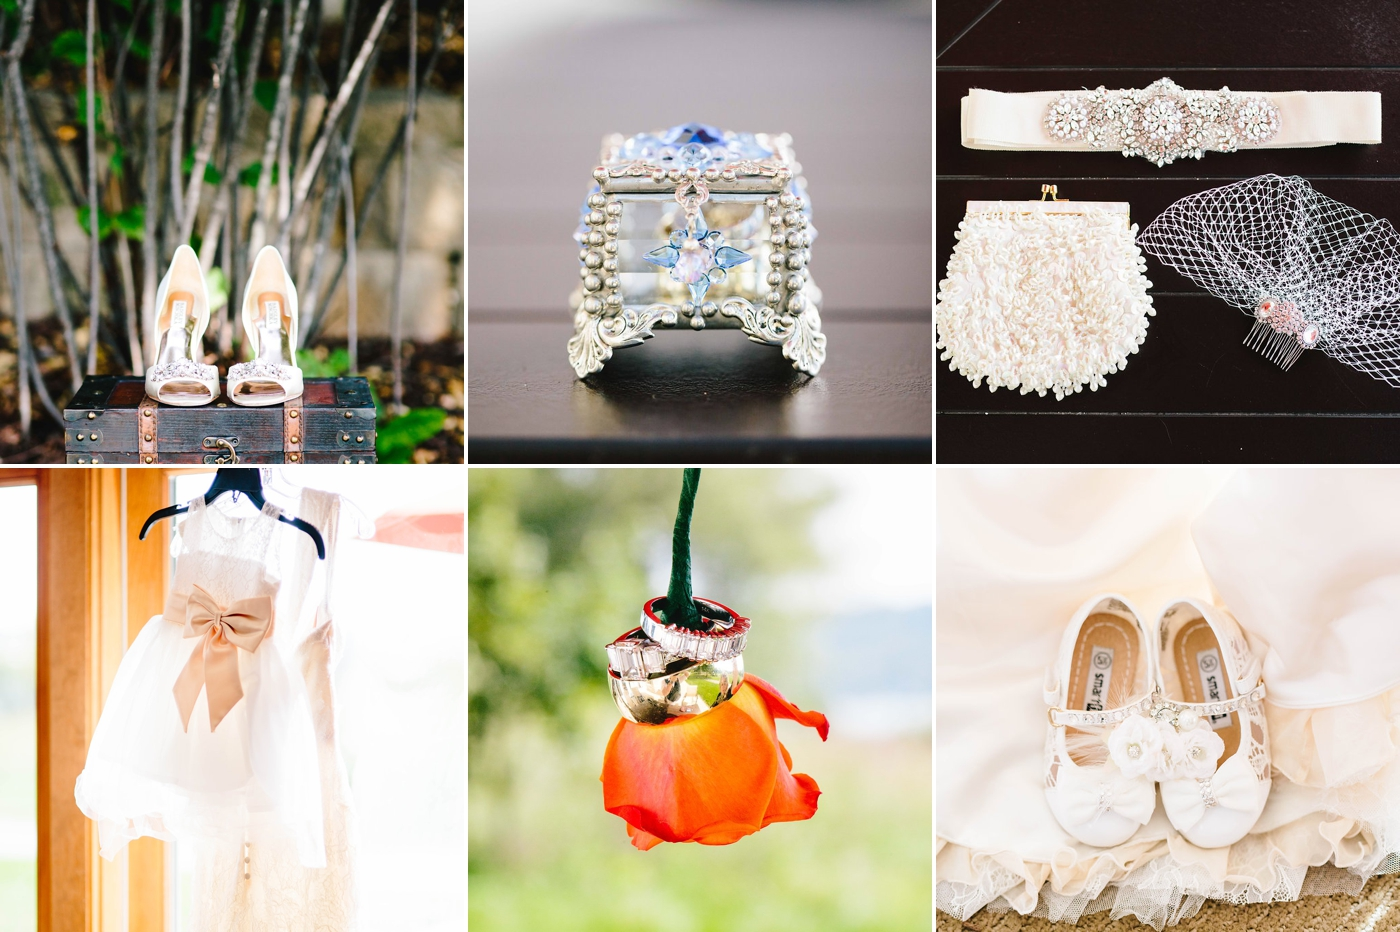 chicago-fine-art-wedding-photography-saylor7